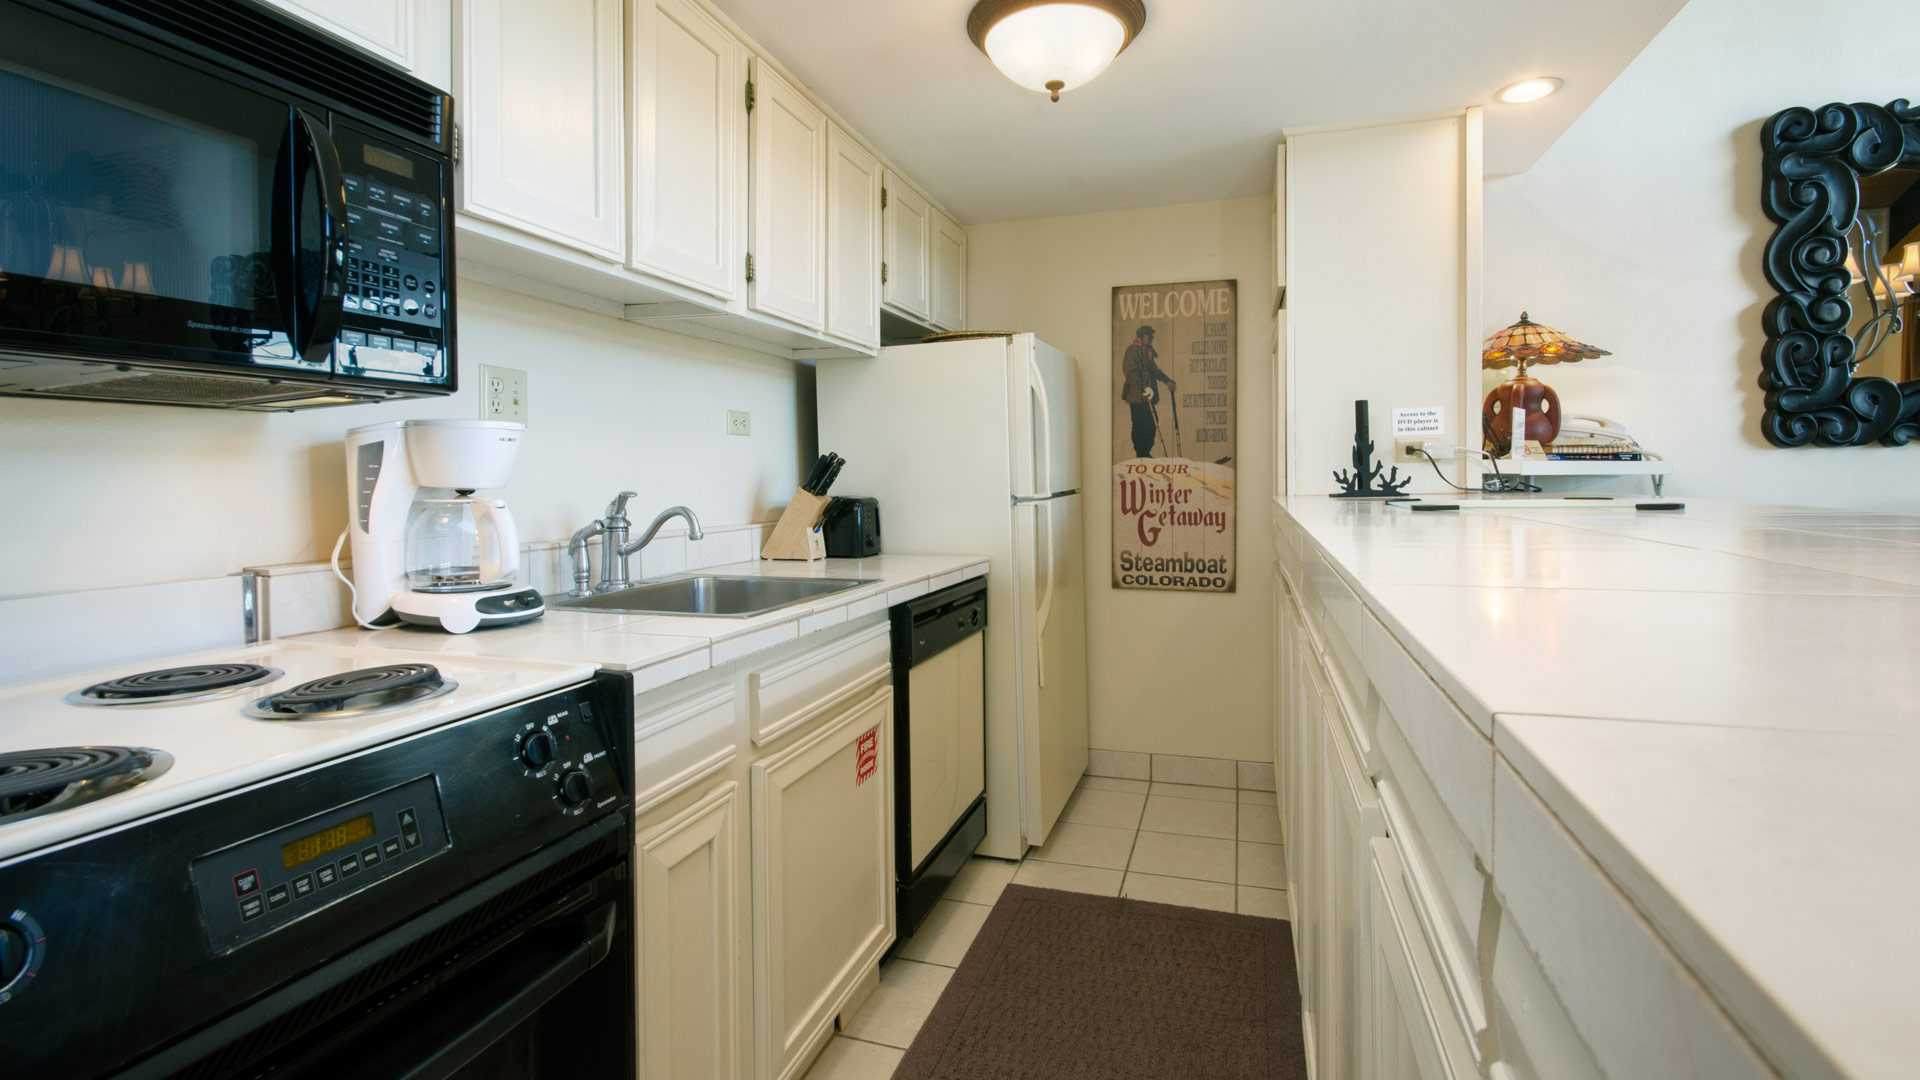 W3433: The West Condominiums